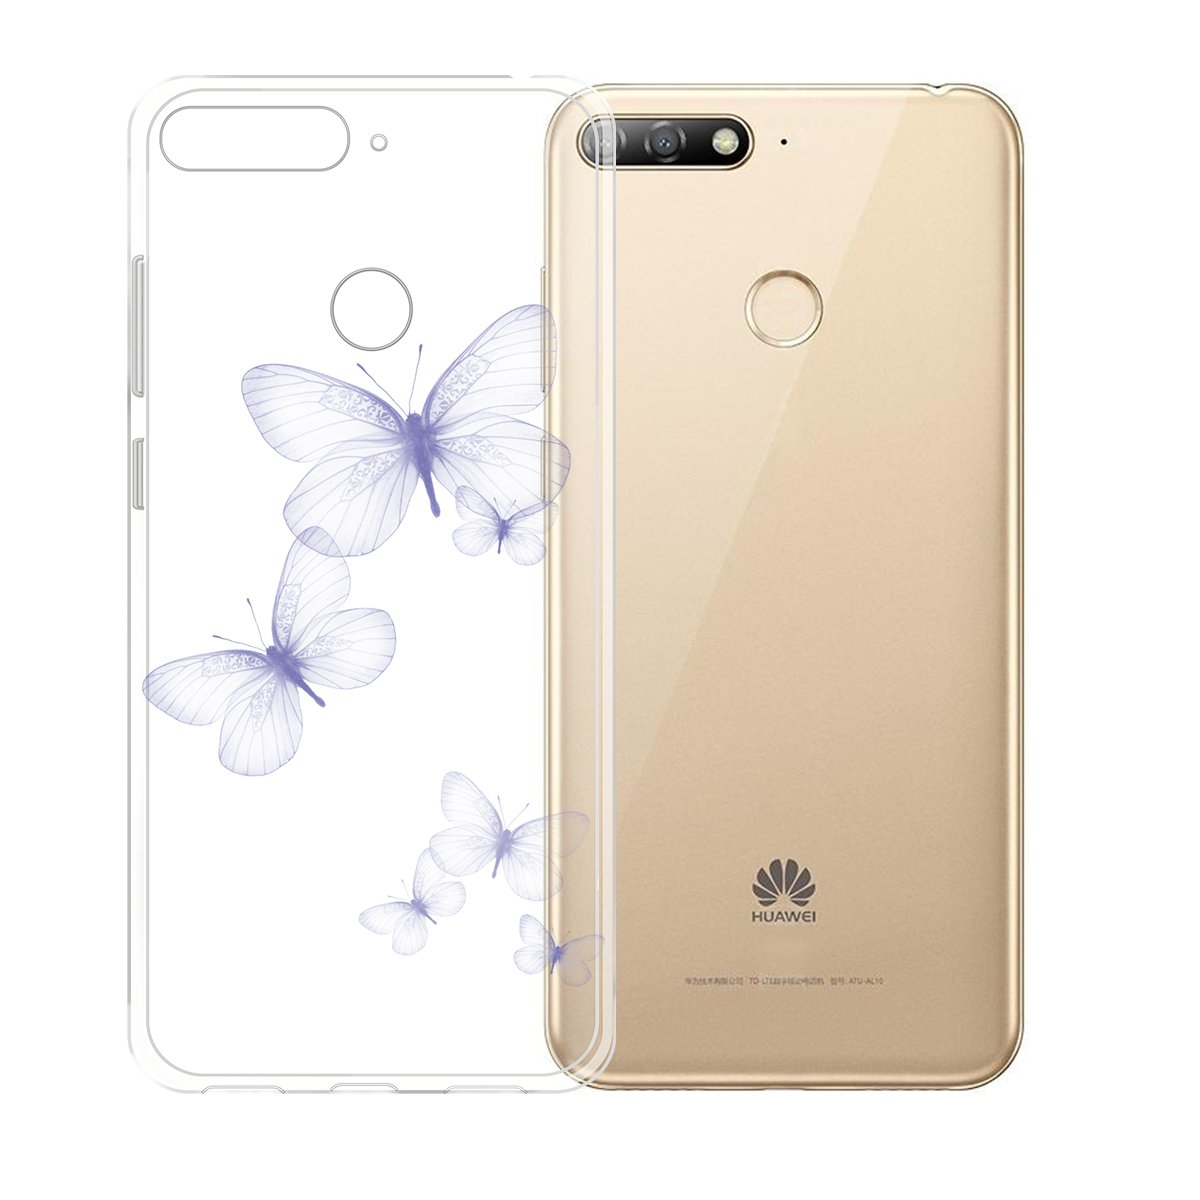 Amazon.com: Huawei Y6 Prime 2018 (5.7